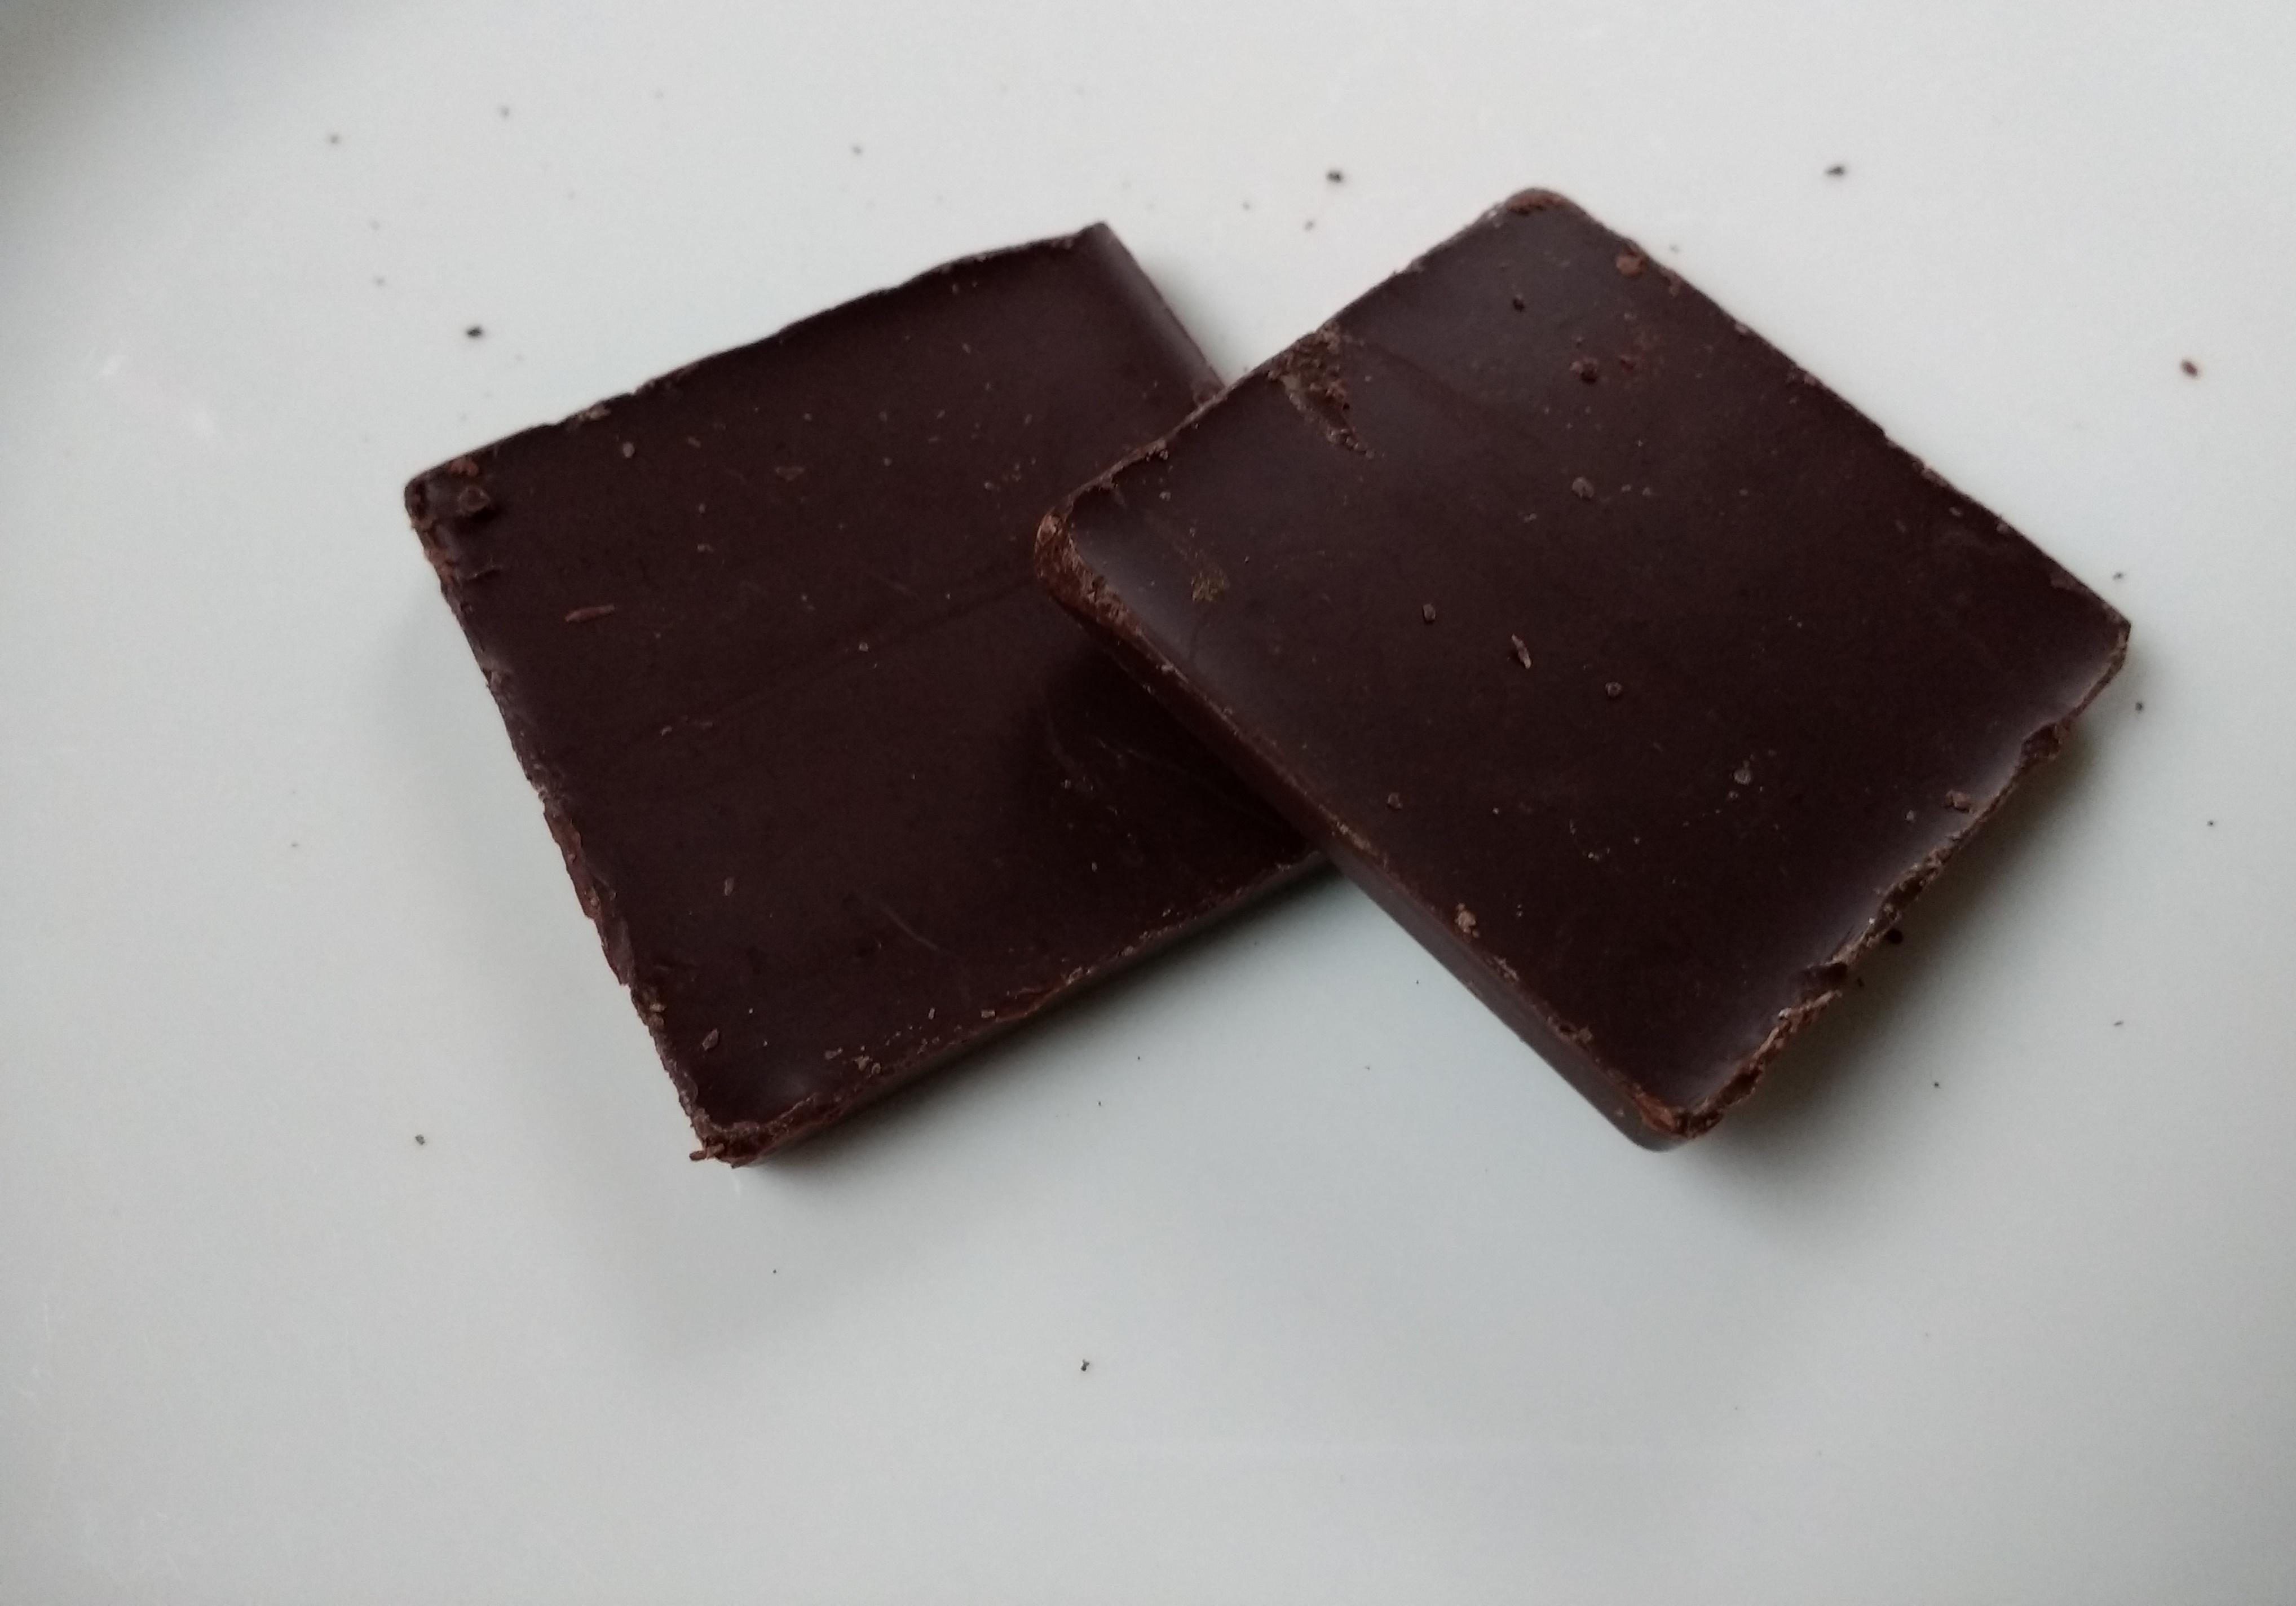 Raw Chocolate Wikipedia